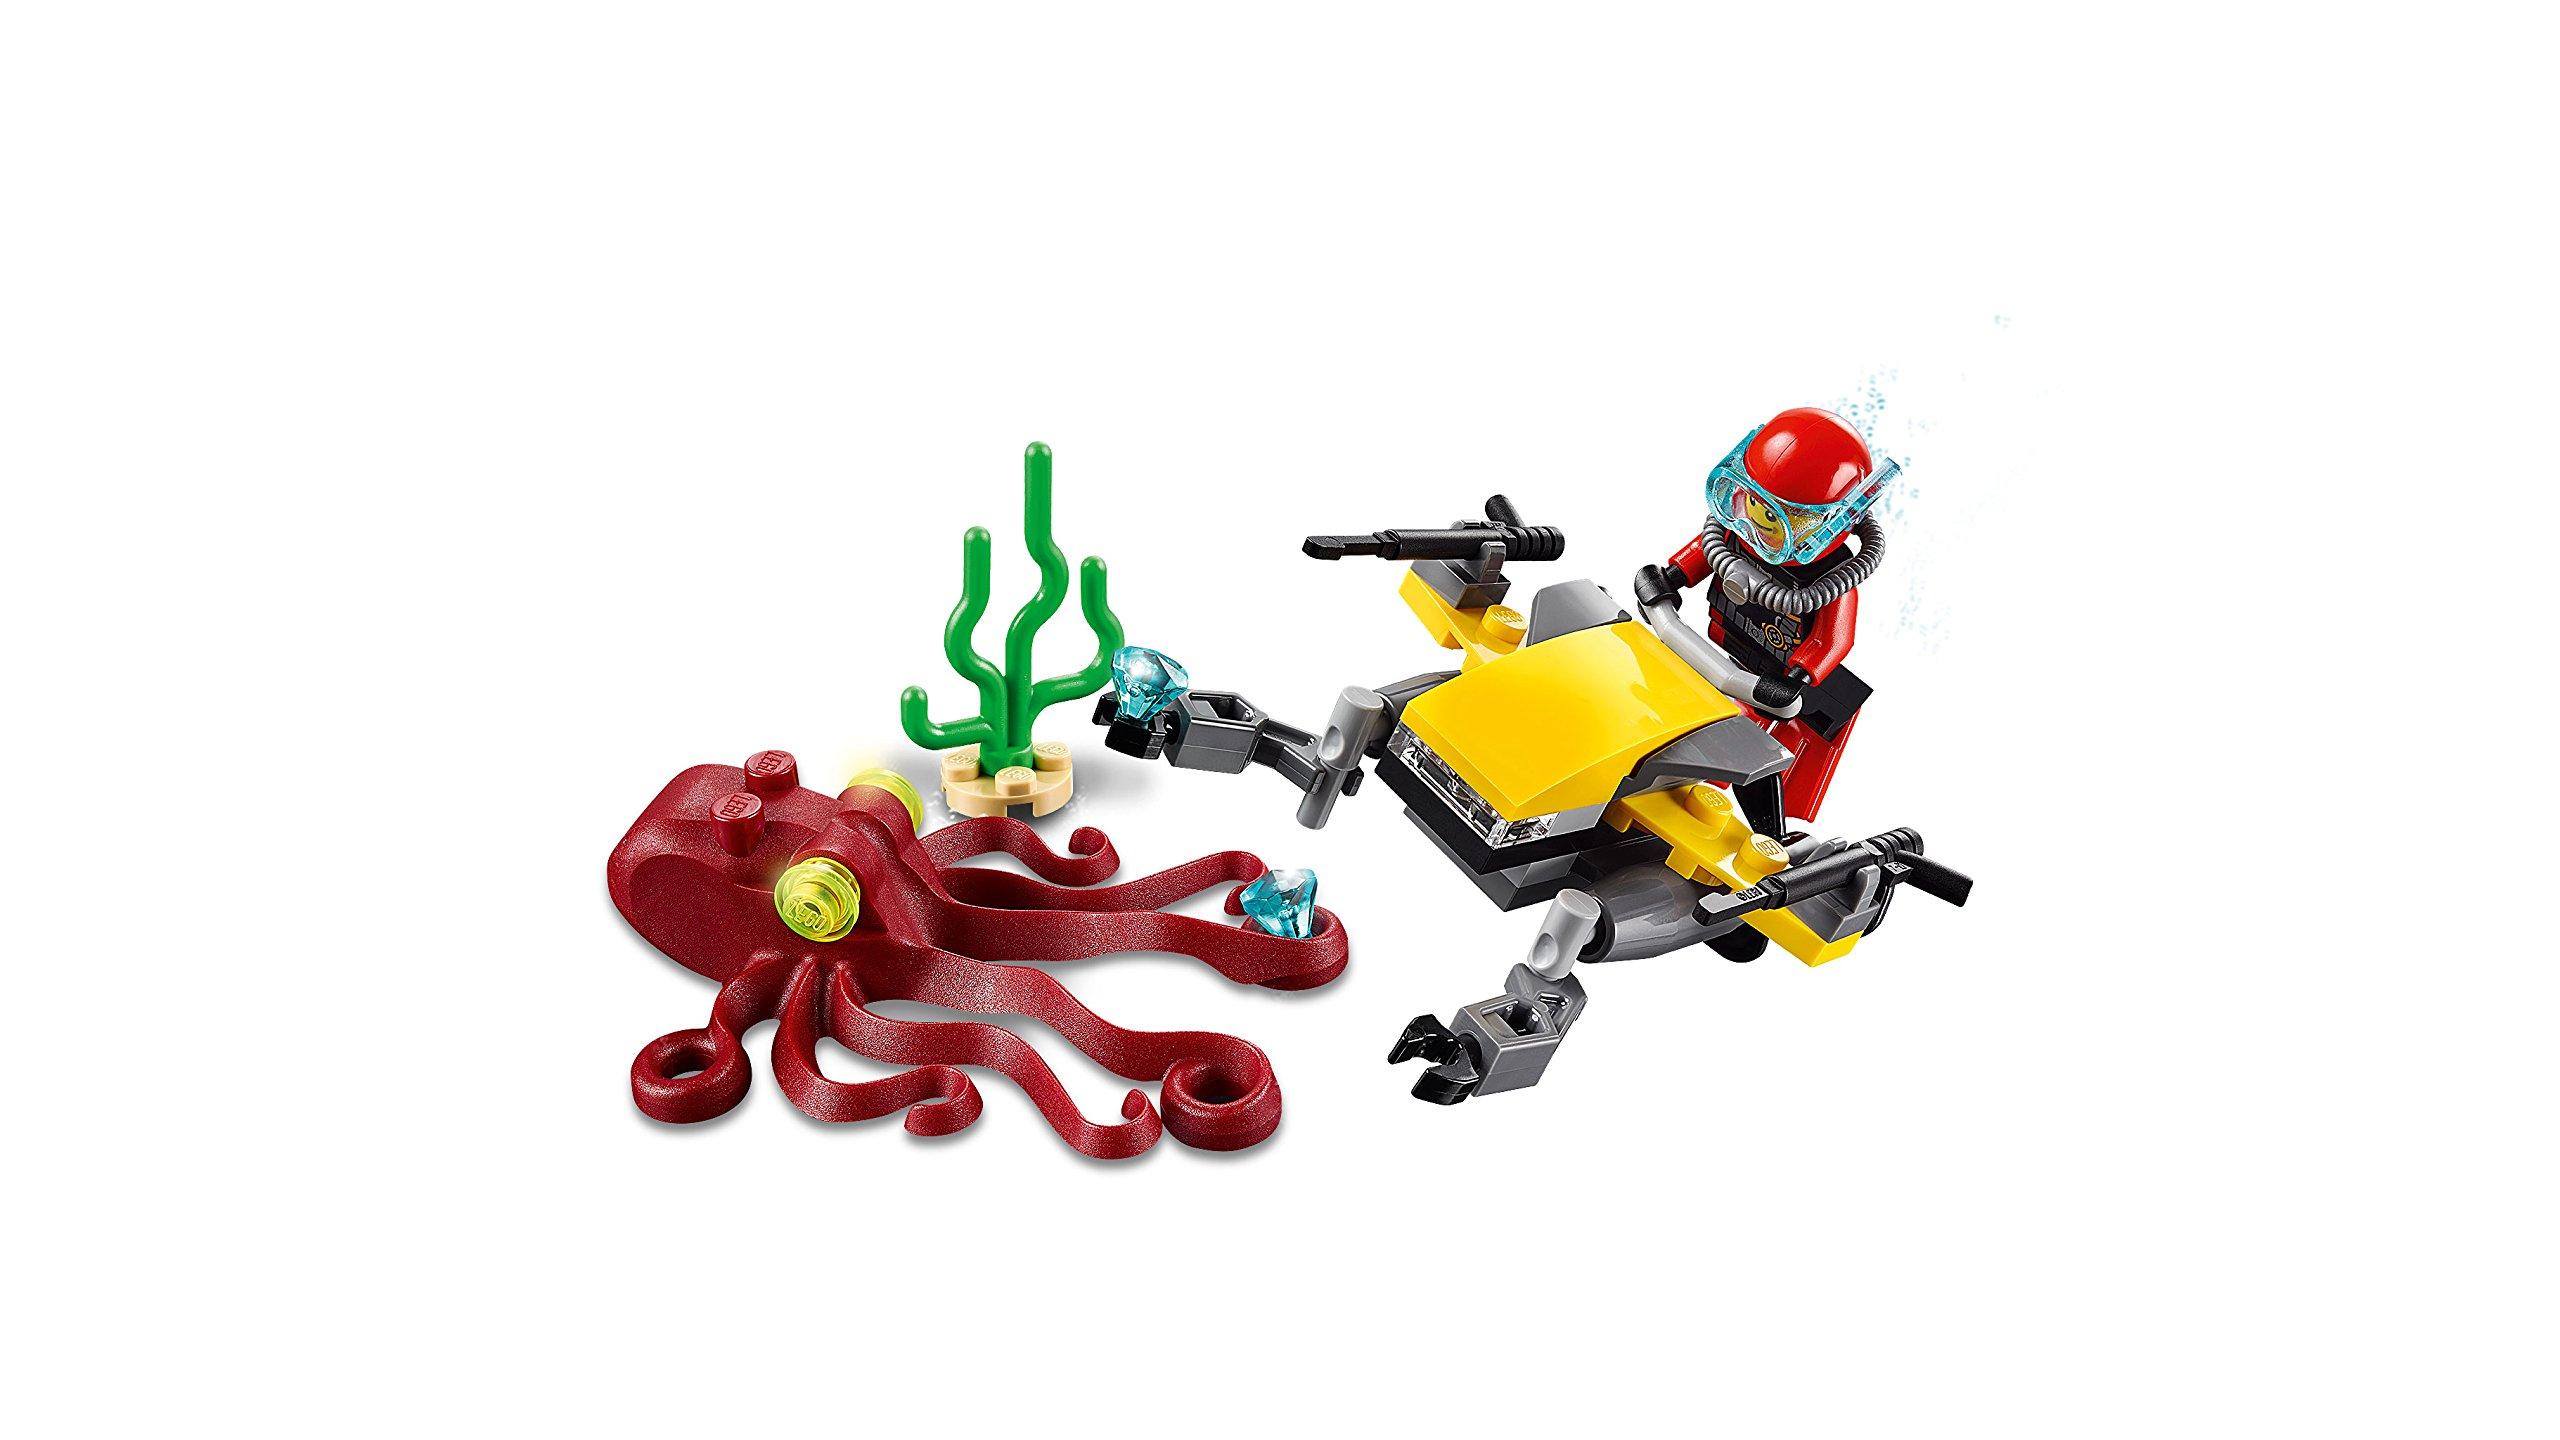 LEGO City Deep Sea Explorers 60090 Scuba Scooter Building Kit by LEGO